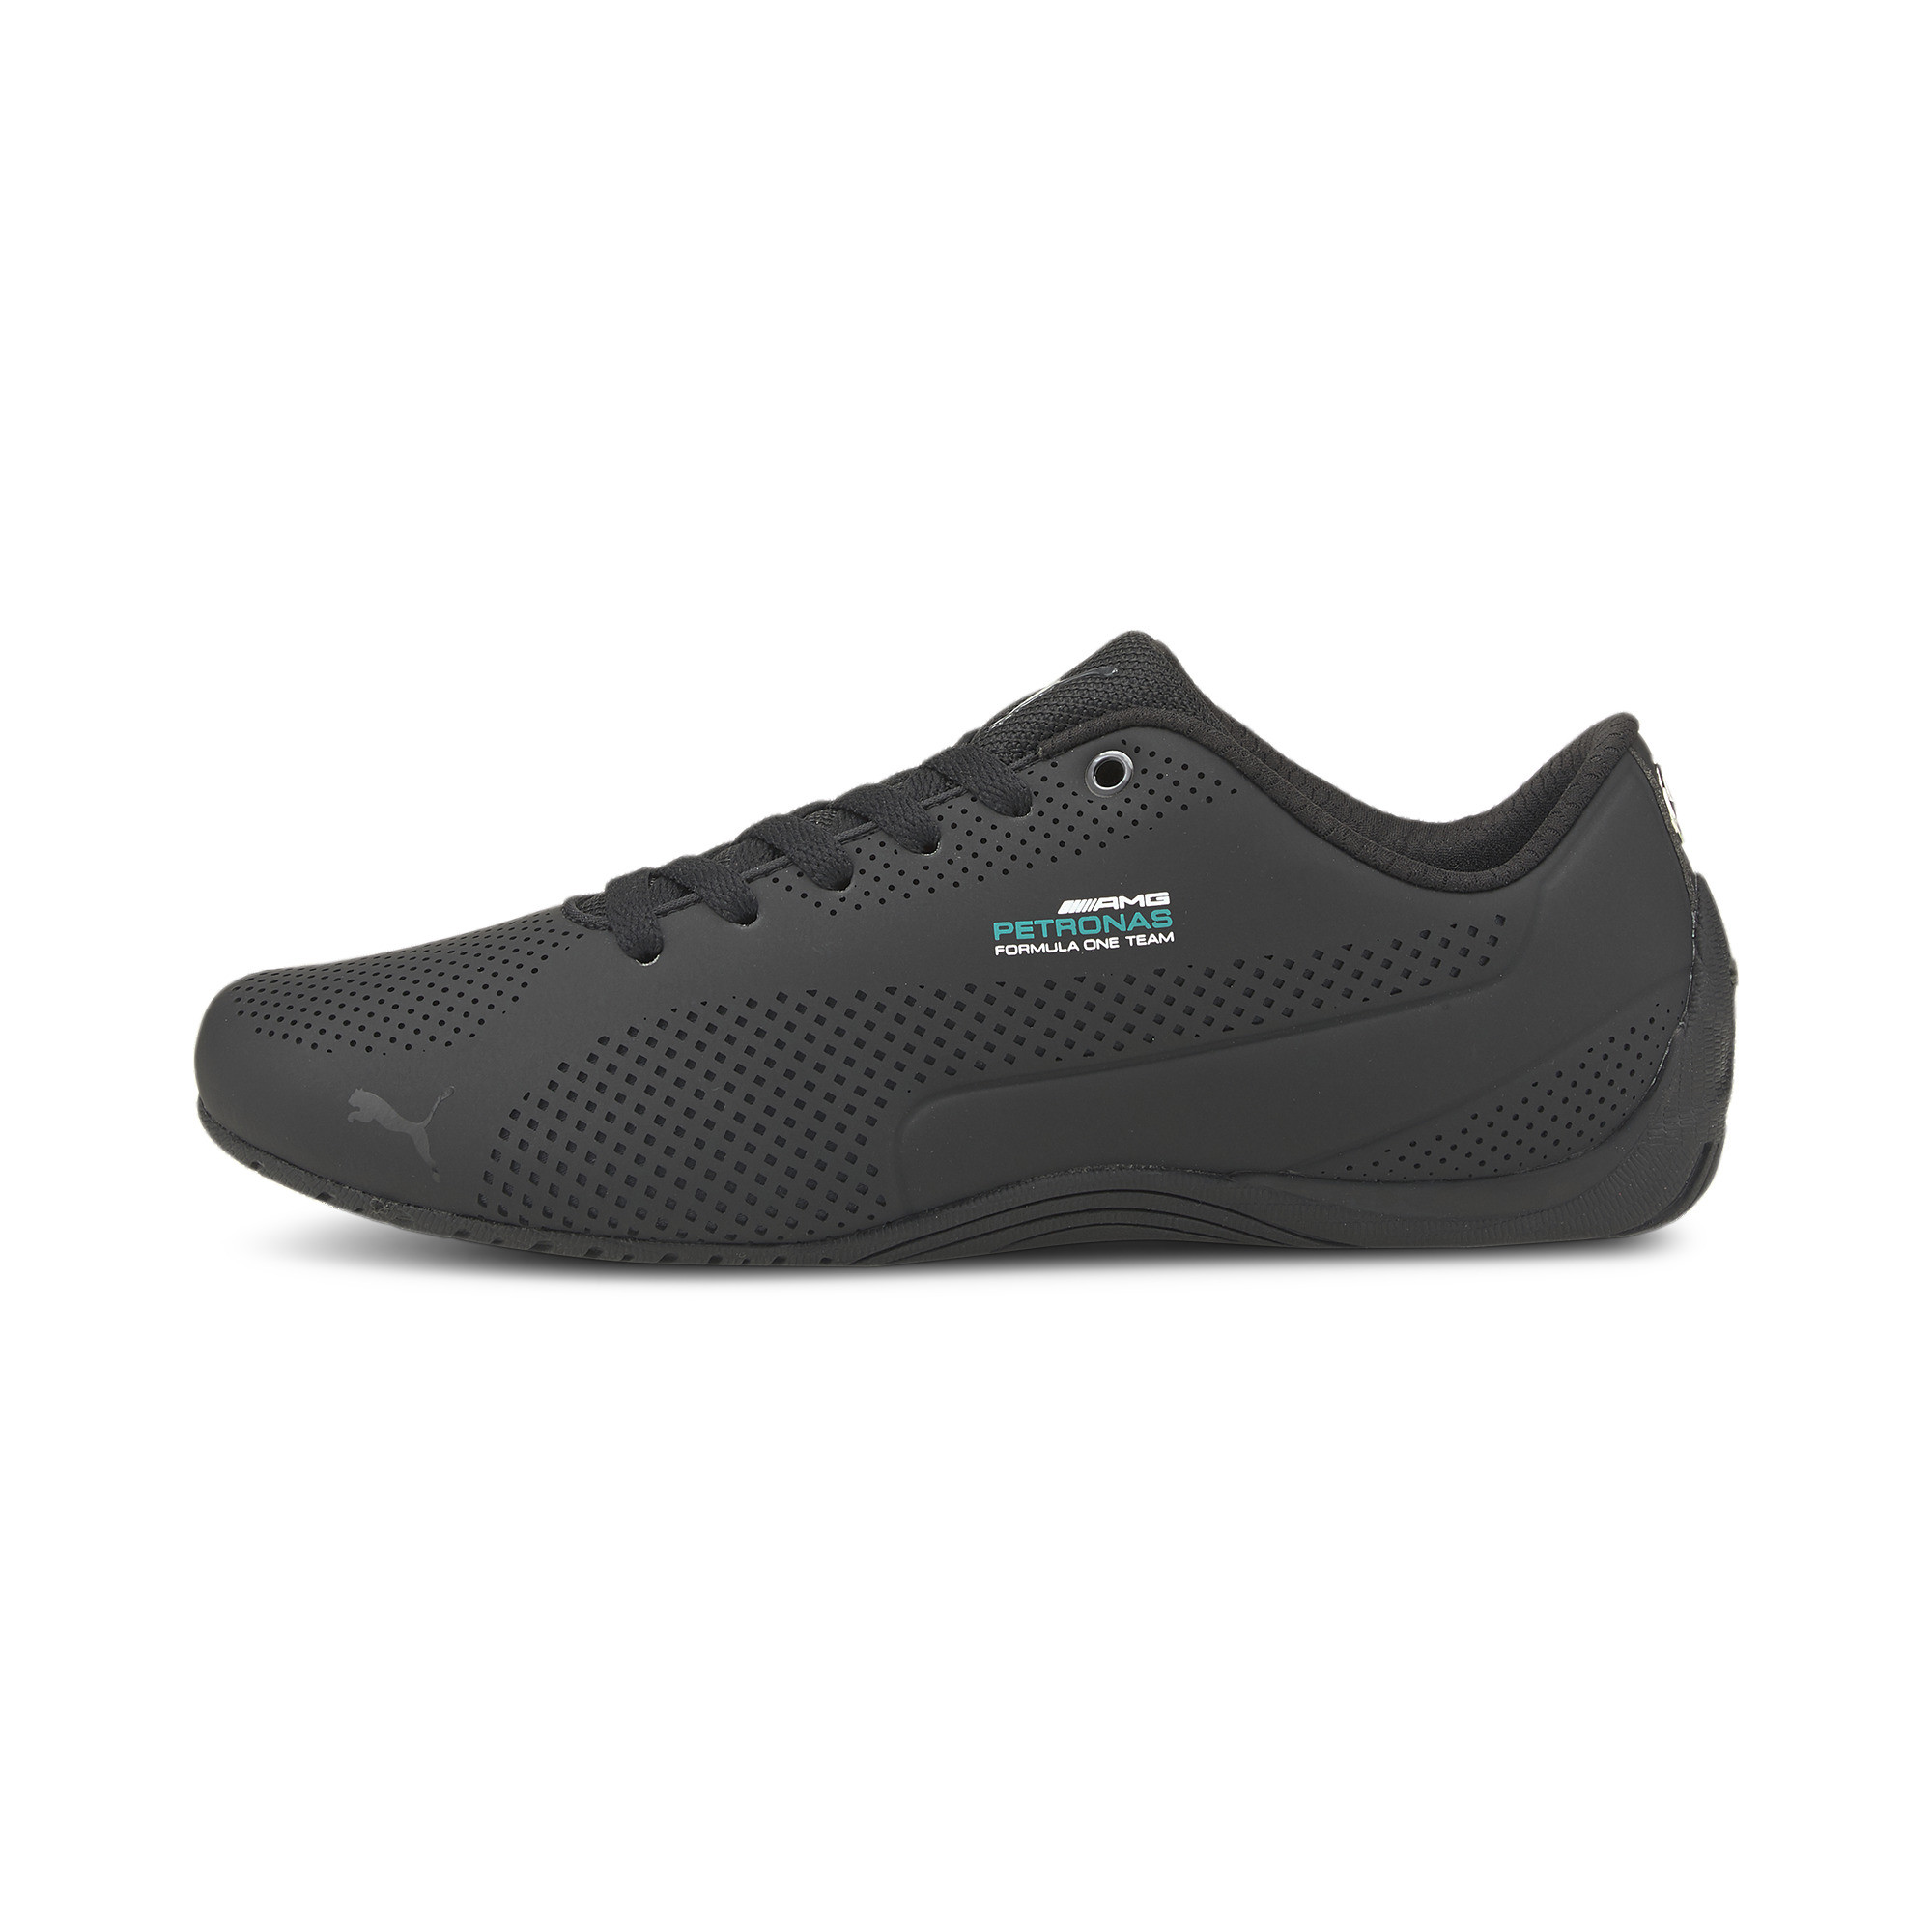 PUMA-MERCEDES-AMG-PETRONAS-Drift-Cat-Ultra-Sneaker-Unisex-Schuhe-Neu Indexbild 4